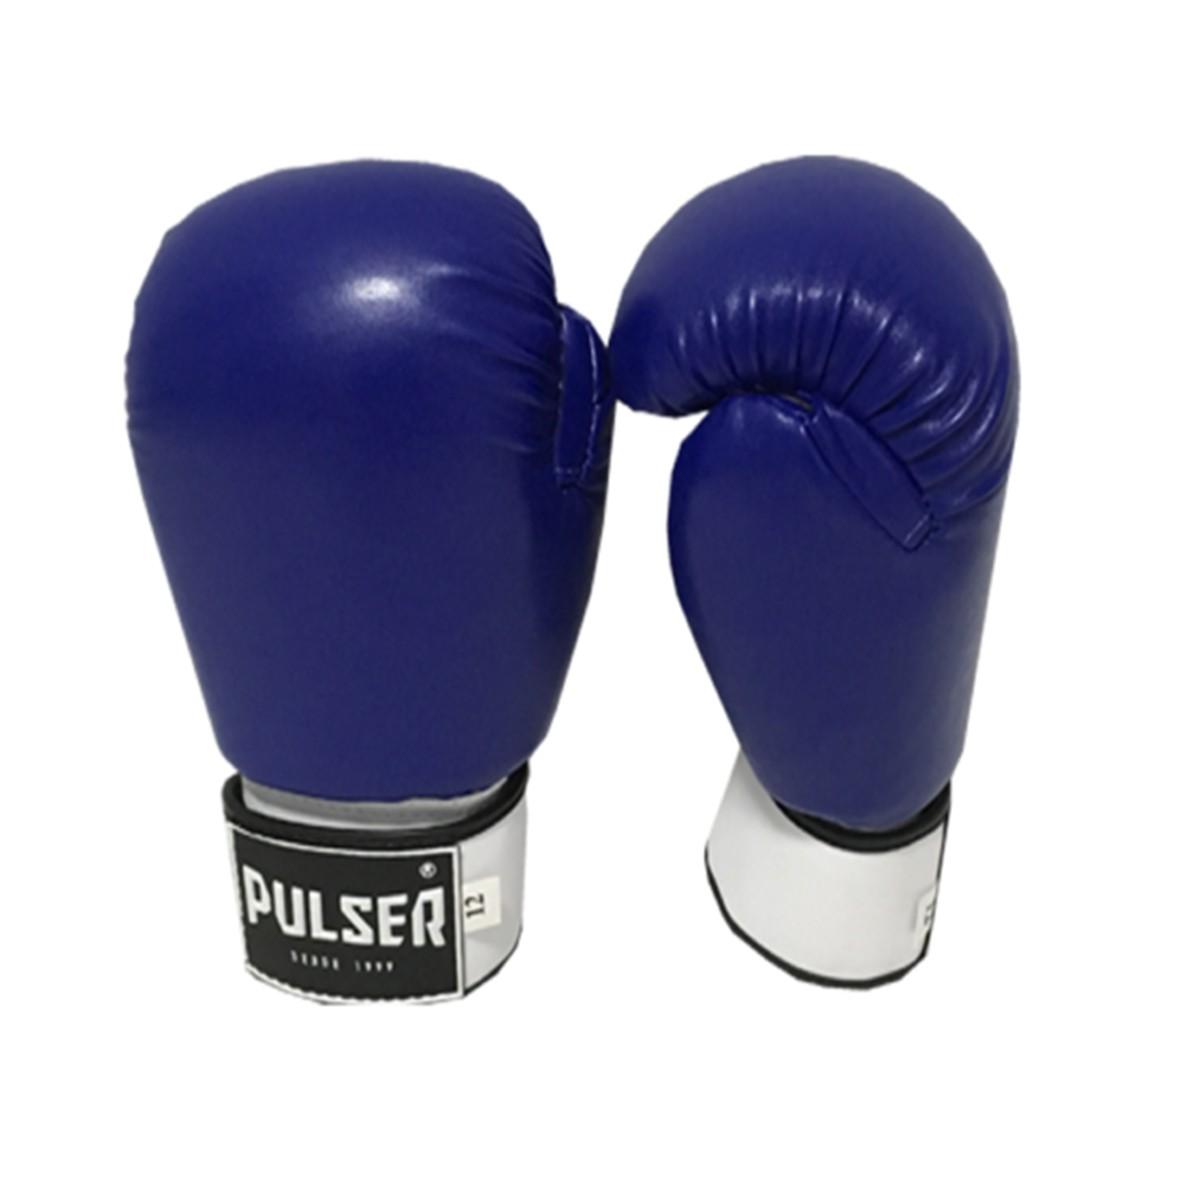 Kit de Muay Thai / Kickboxing 12oz - Azul - Pulser  - PRALUTA SHOP